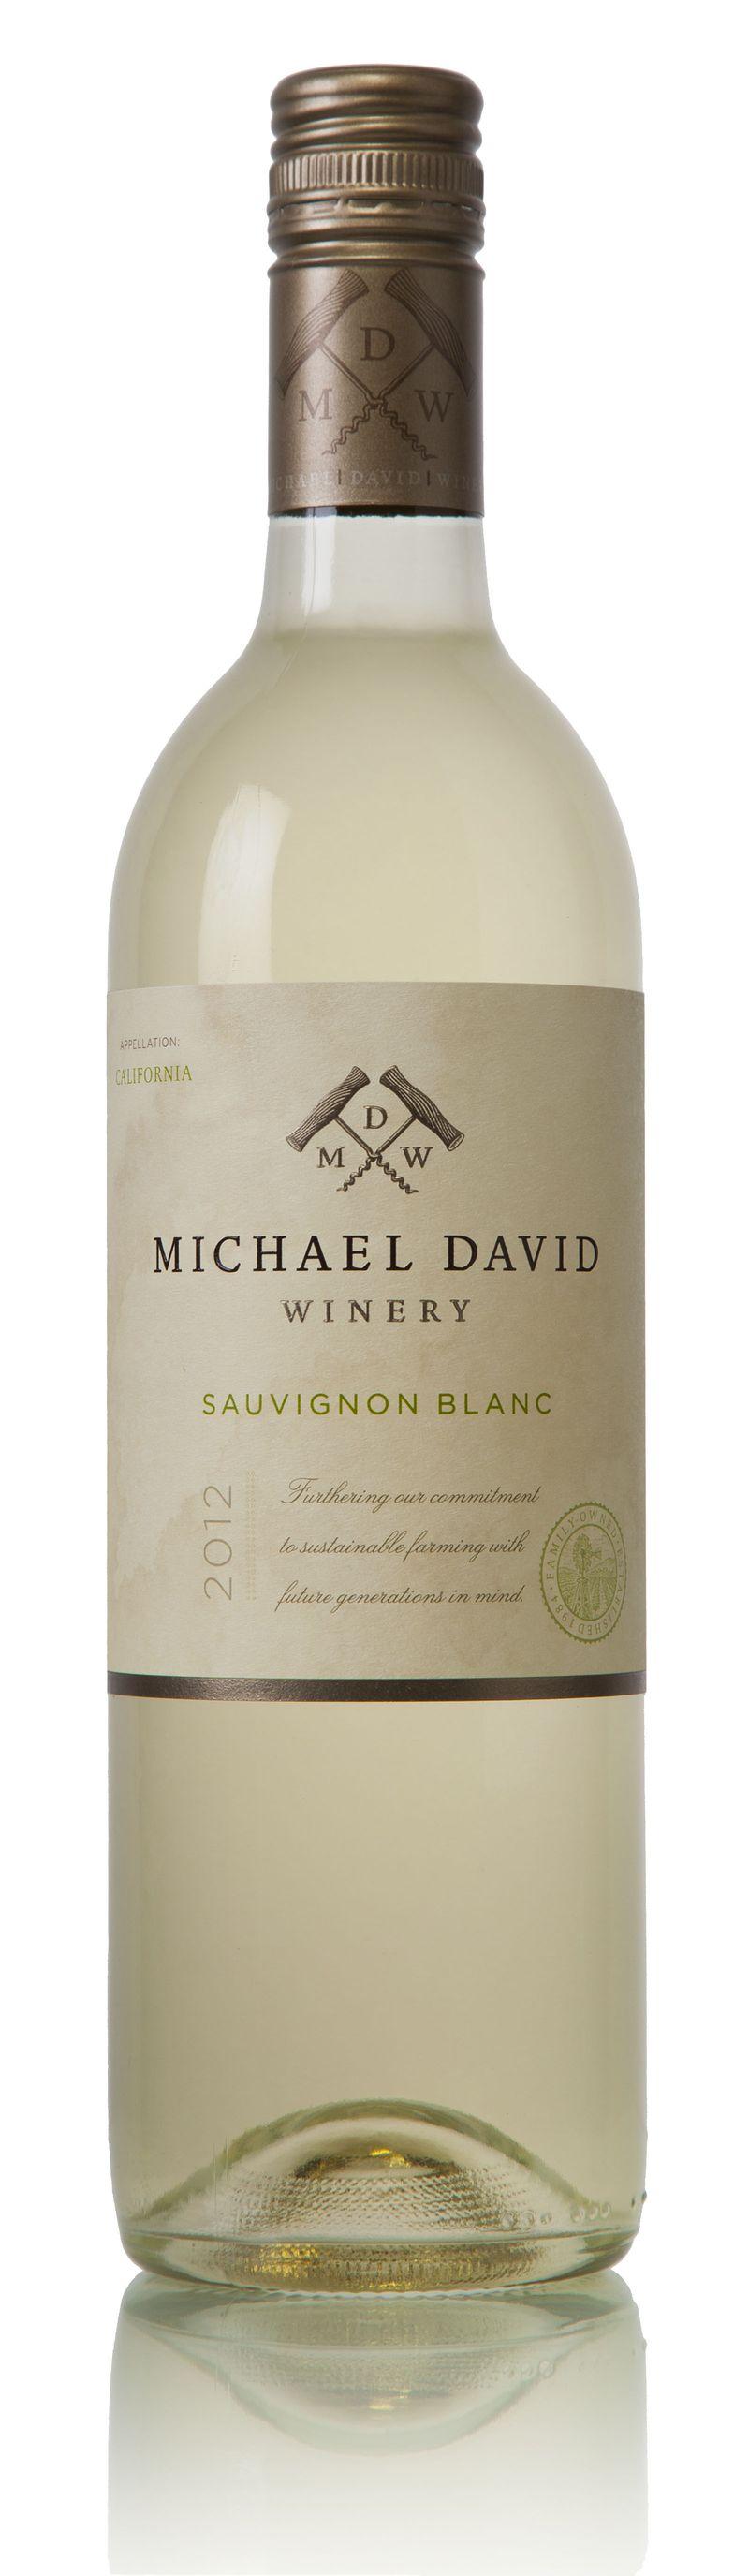 2012-sauv-blanc_1565